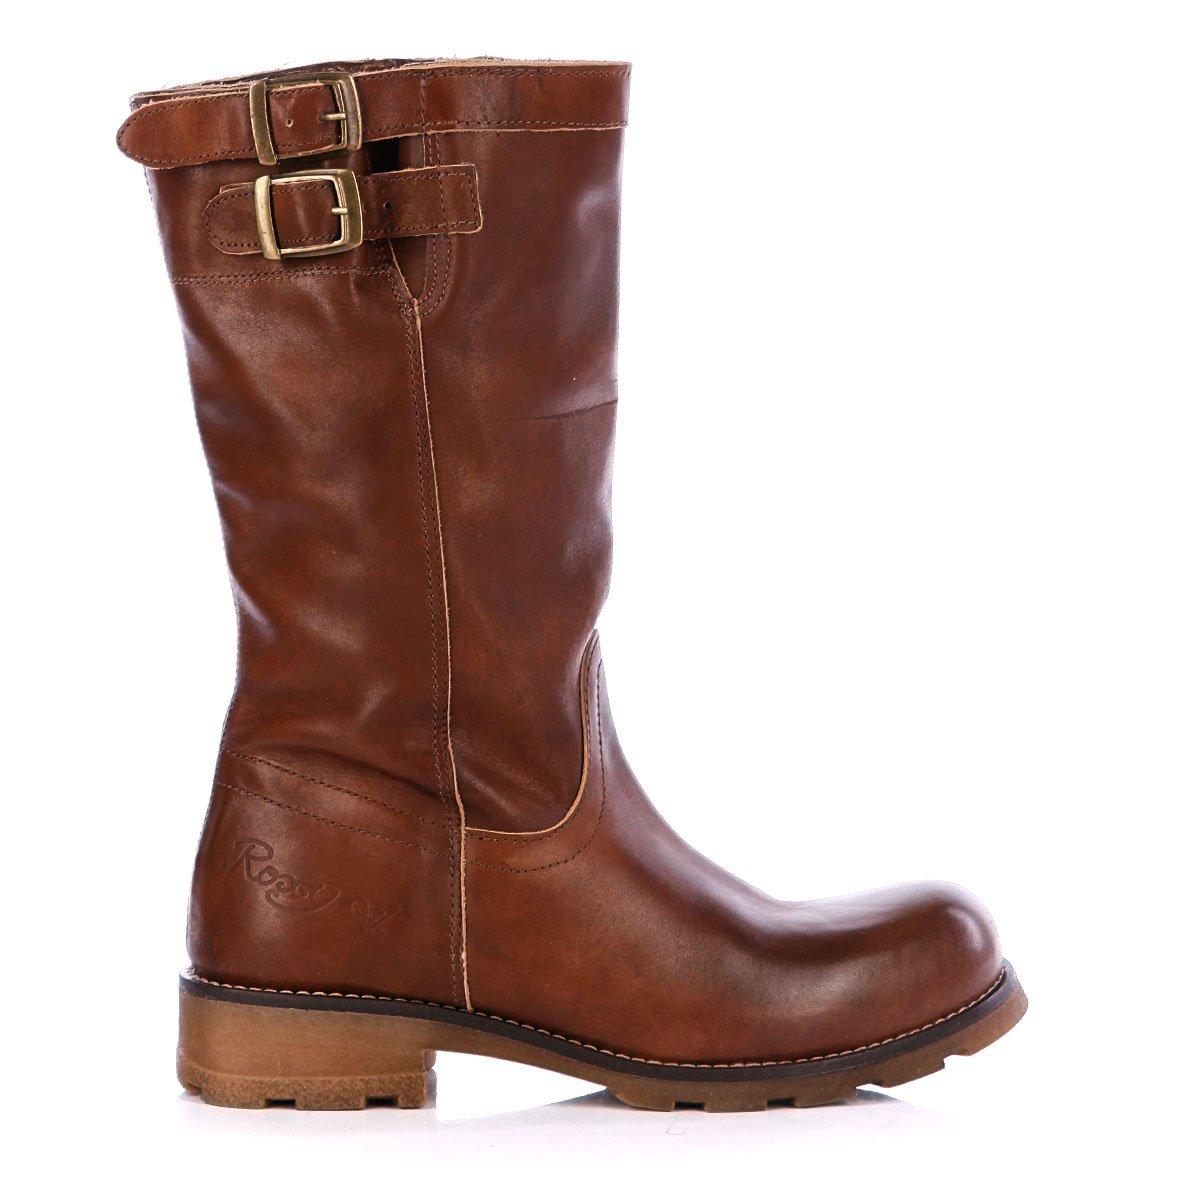 75c2db27234c Купить сапоги женские Roxy Jessica Brown (WPWSL292) в интернет ...